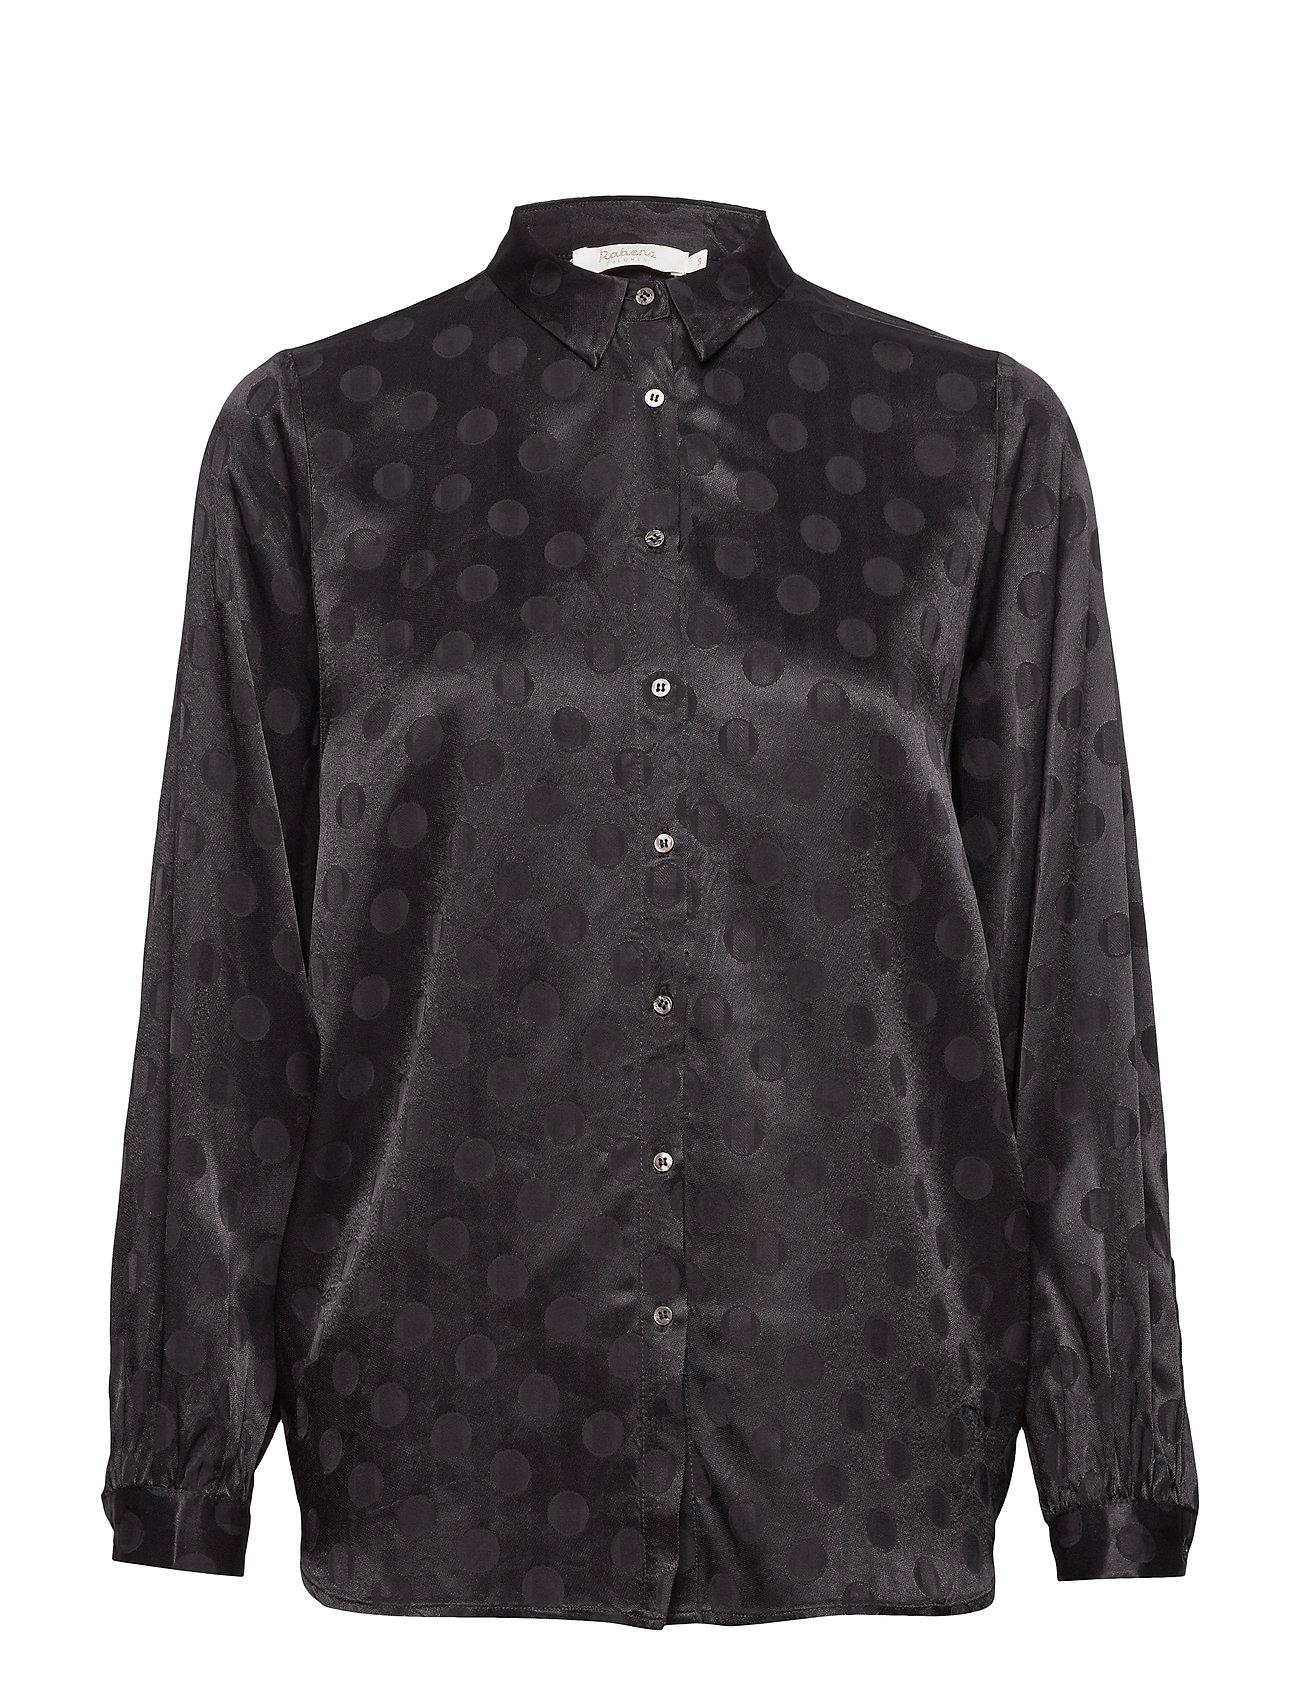 Rabens Saloner Dot jacquard shirt - BLACK